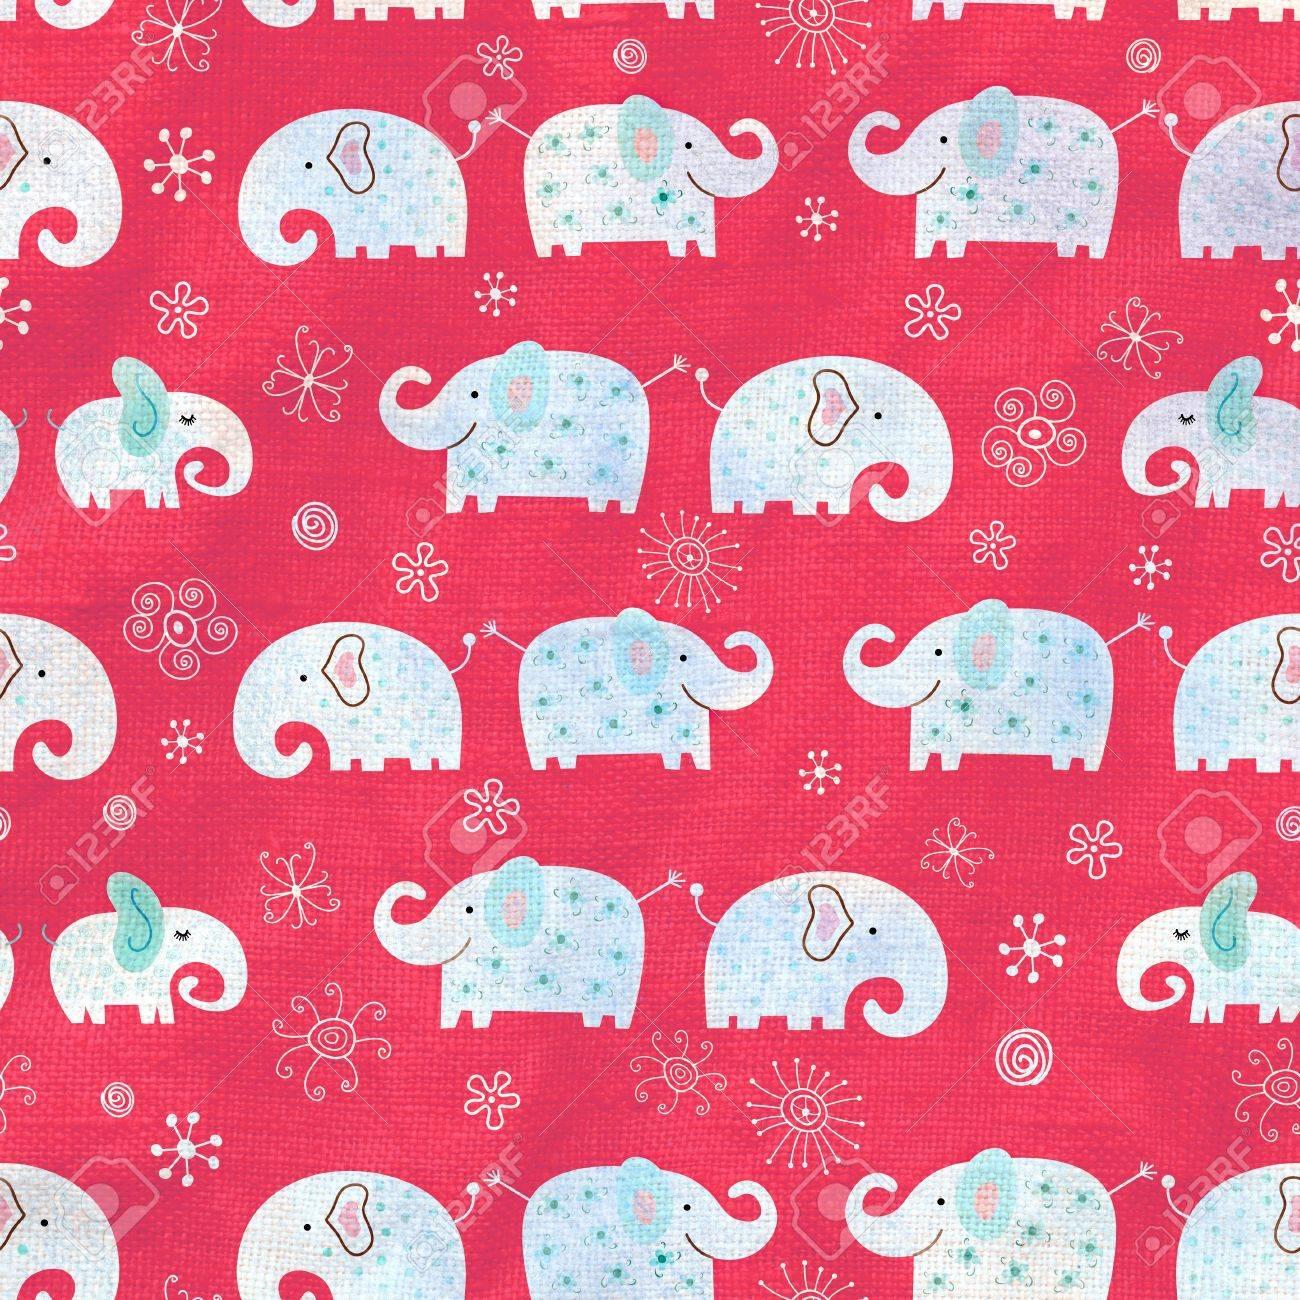 Seamless vivid pattern with elephants on a purple background Stock Photo - 19244652